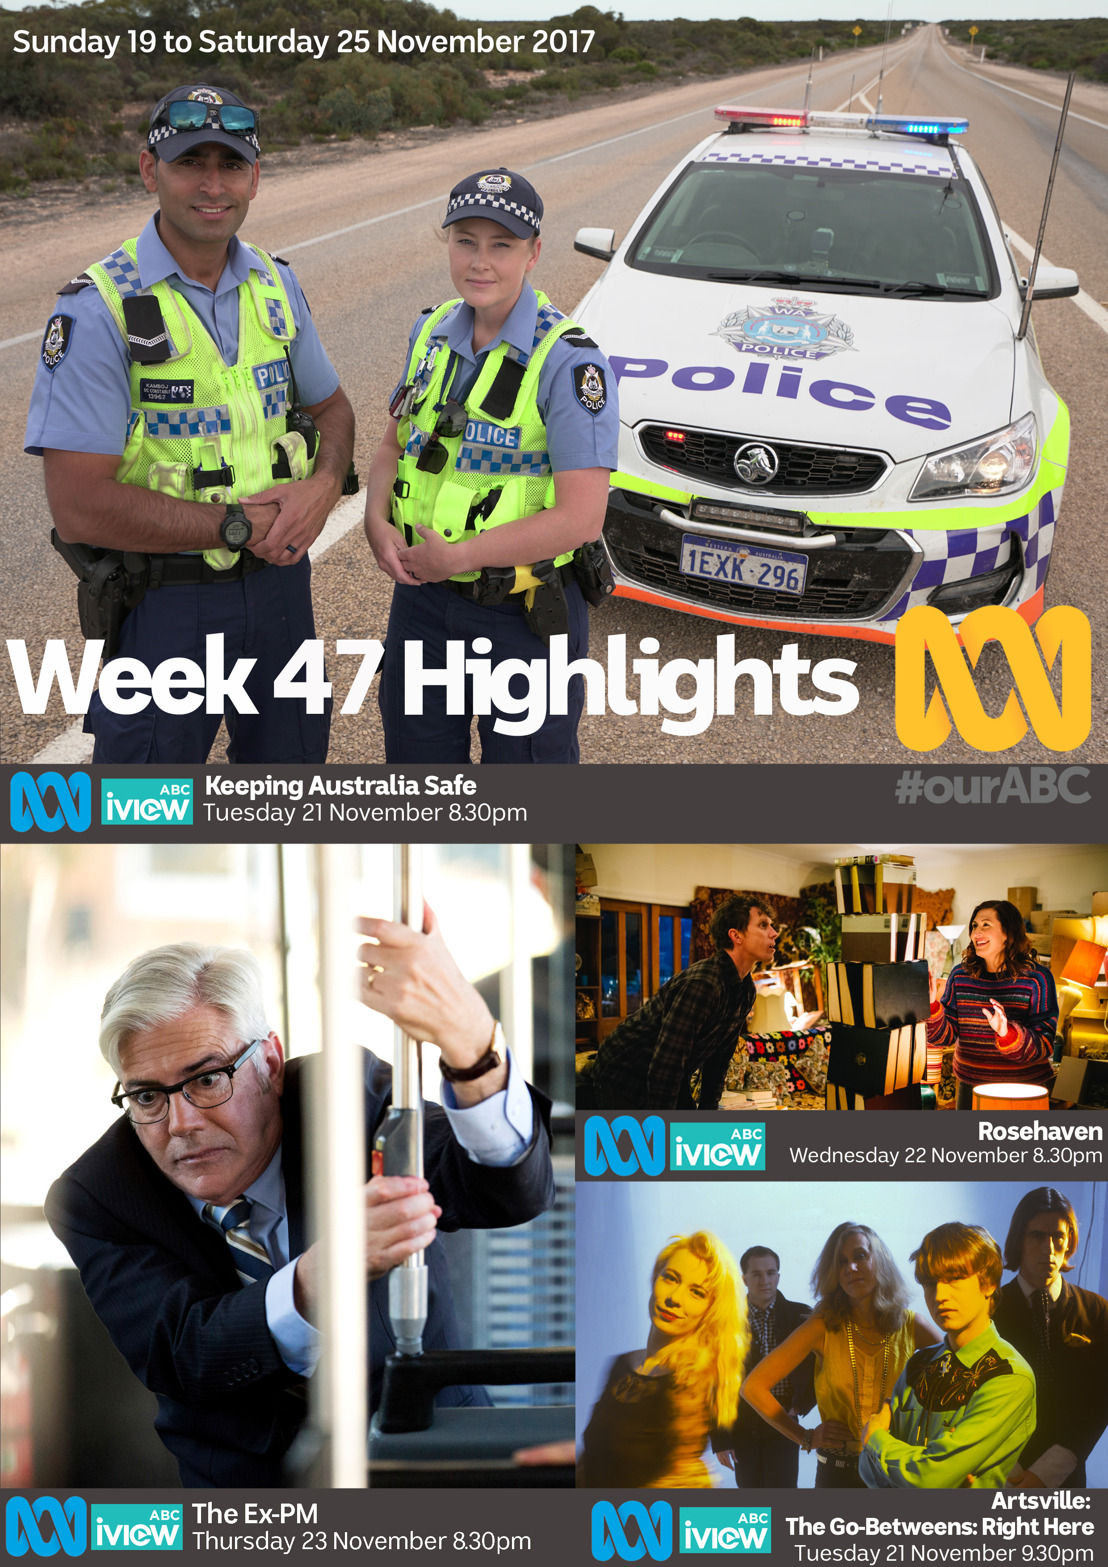 ABC Program Highlights - Week 47